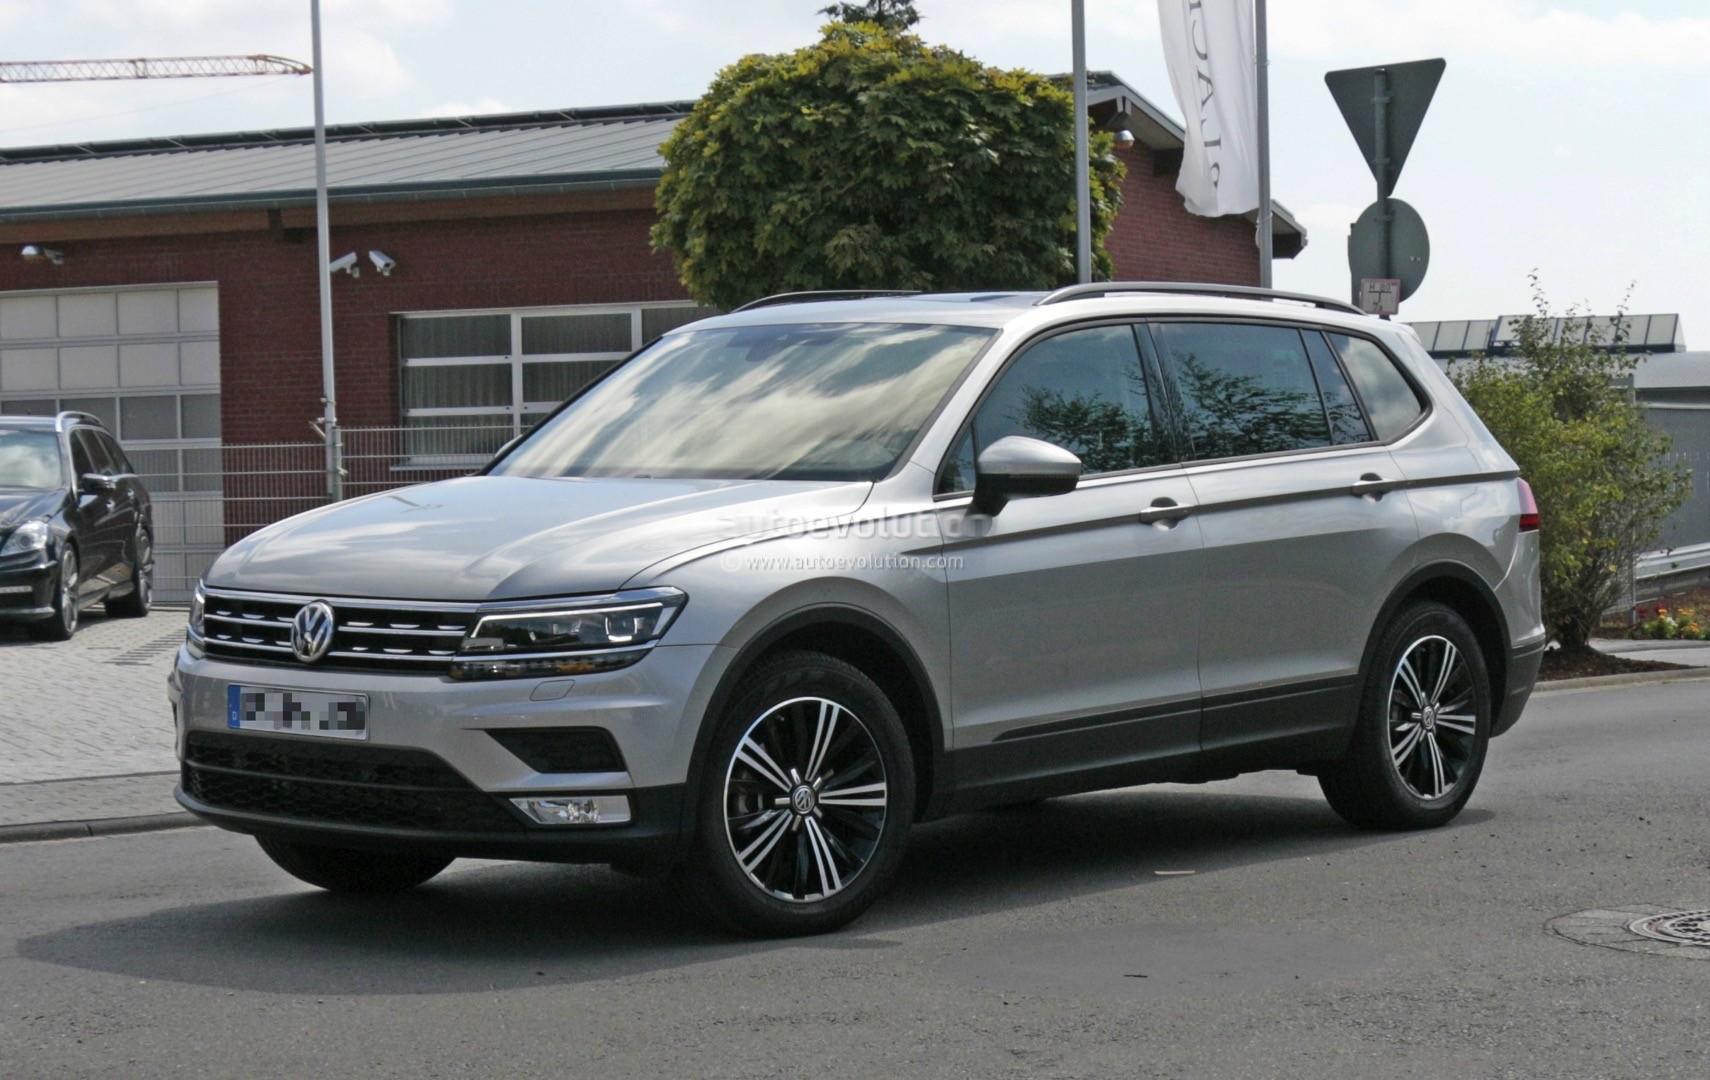 Used Vw Amarok >> 2018 Volkswagen Tiguan Allspace 7-Seater Teased for Detroit - autoevolution